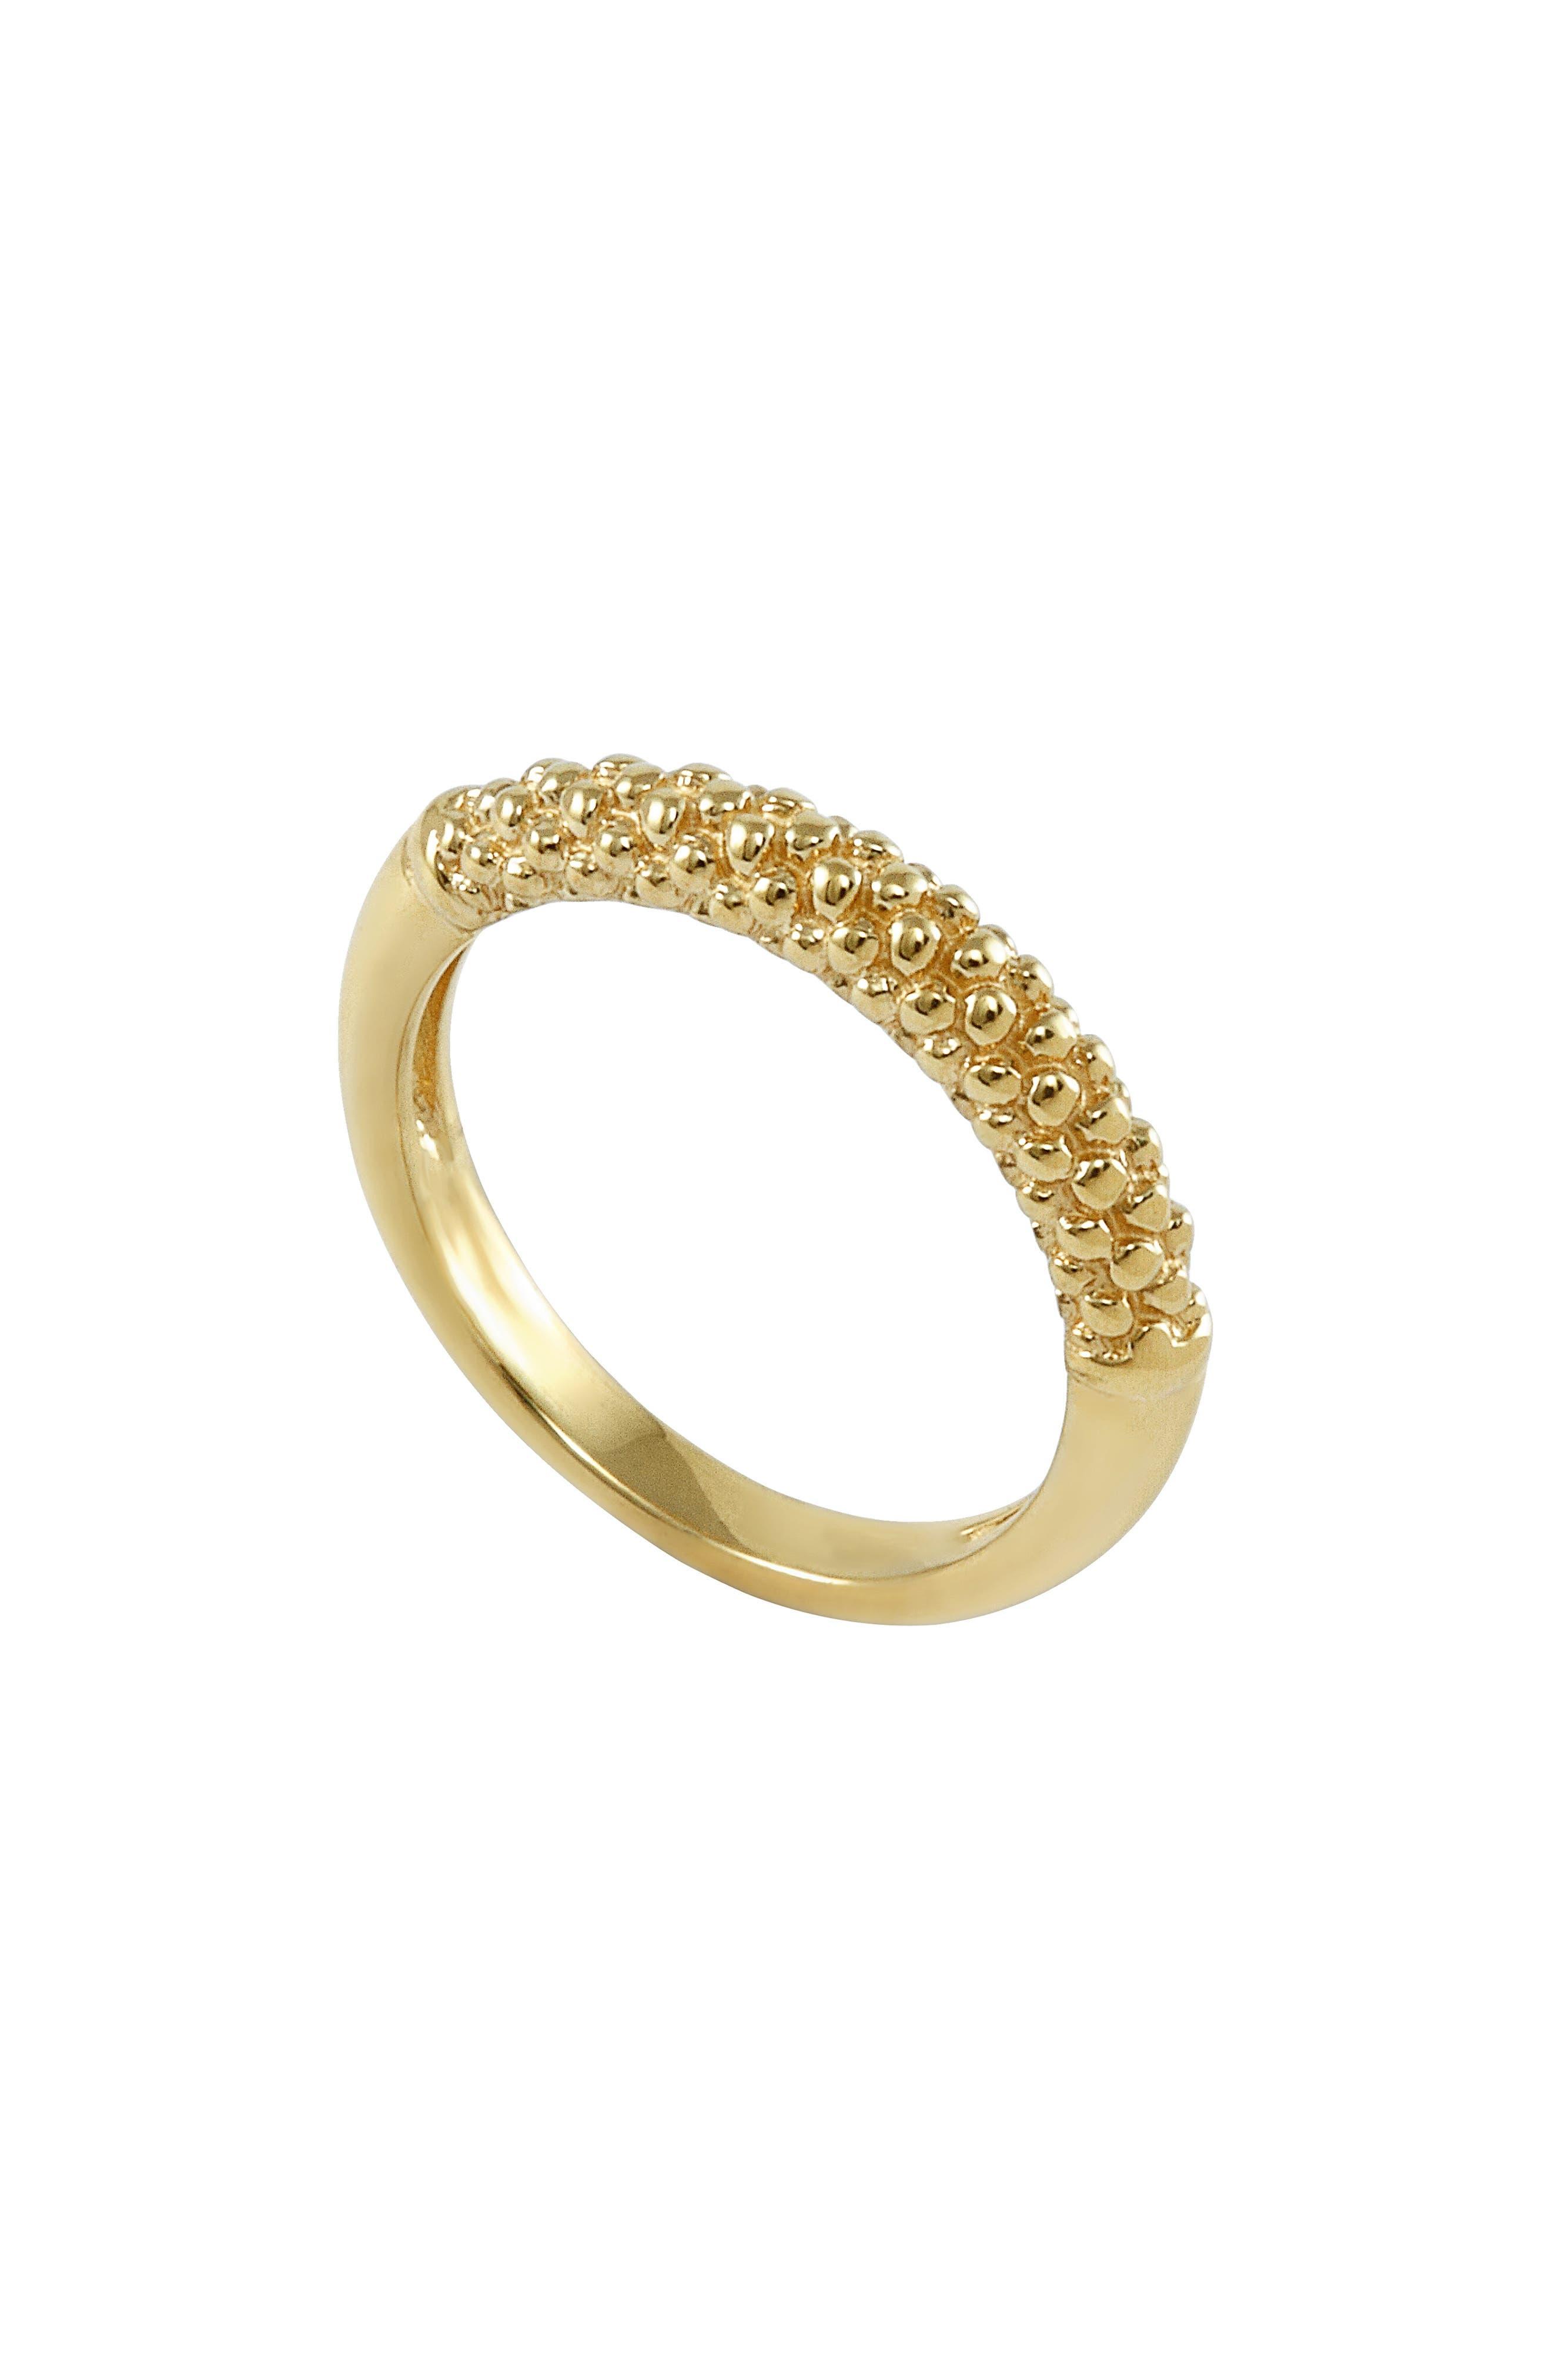 Caviar Band Ring,                         Main,                         color, Gold